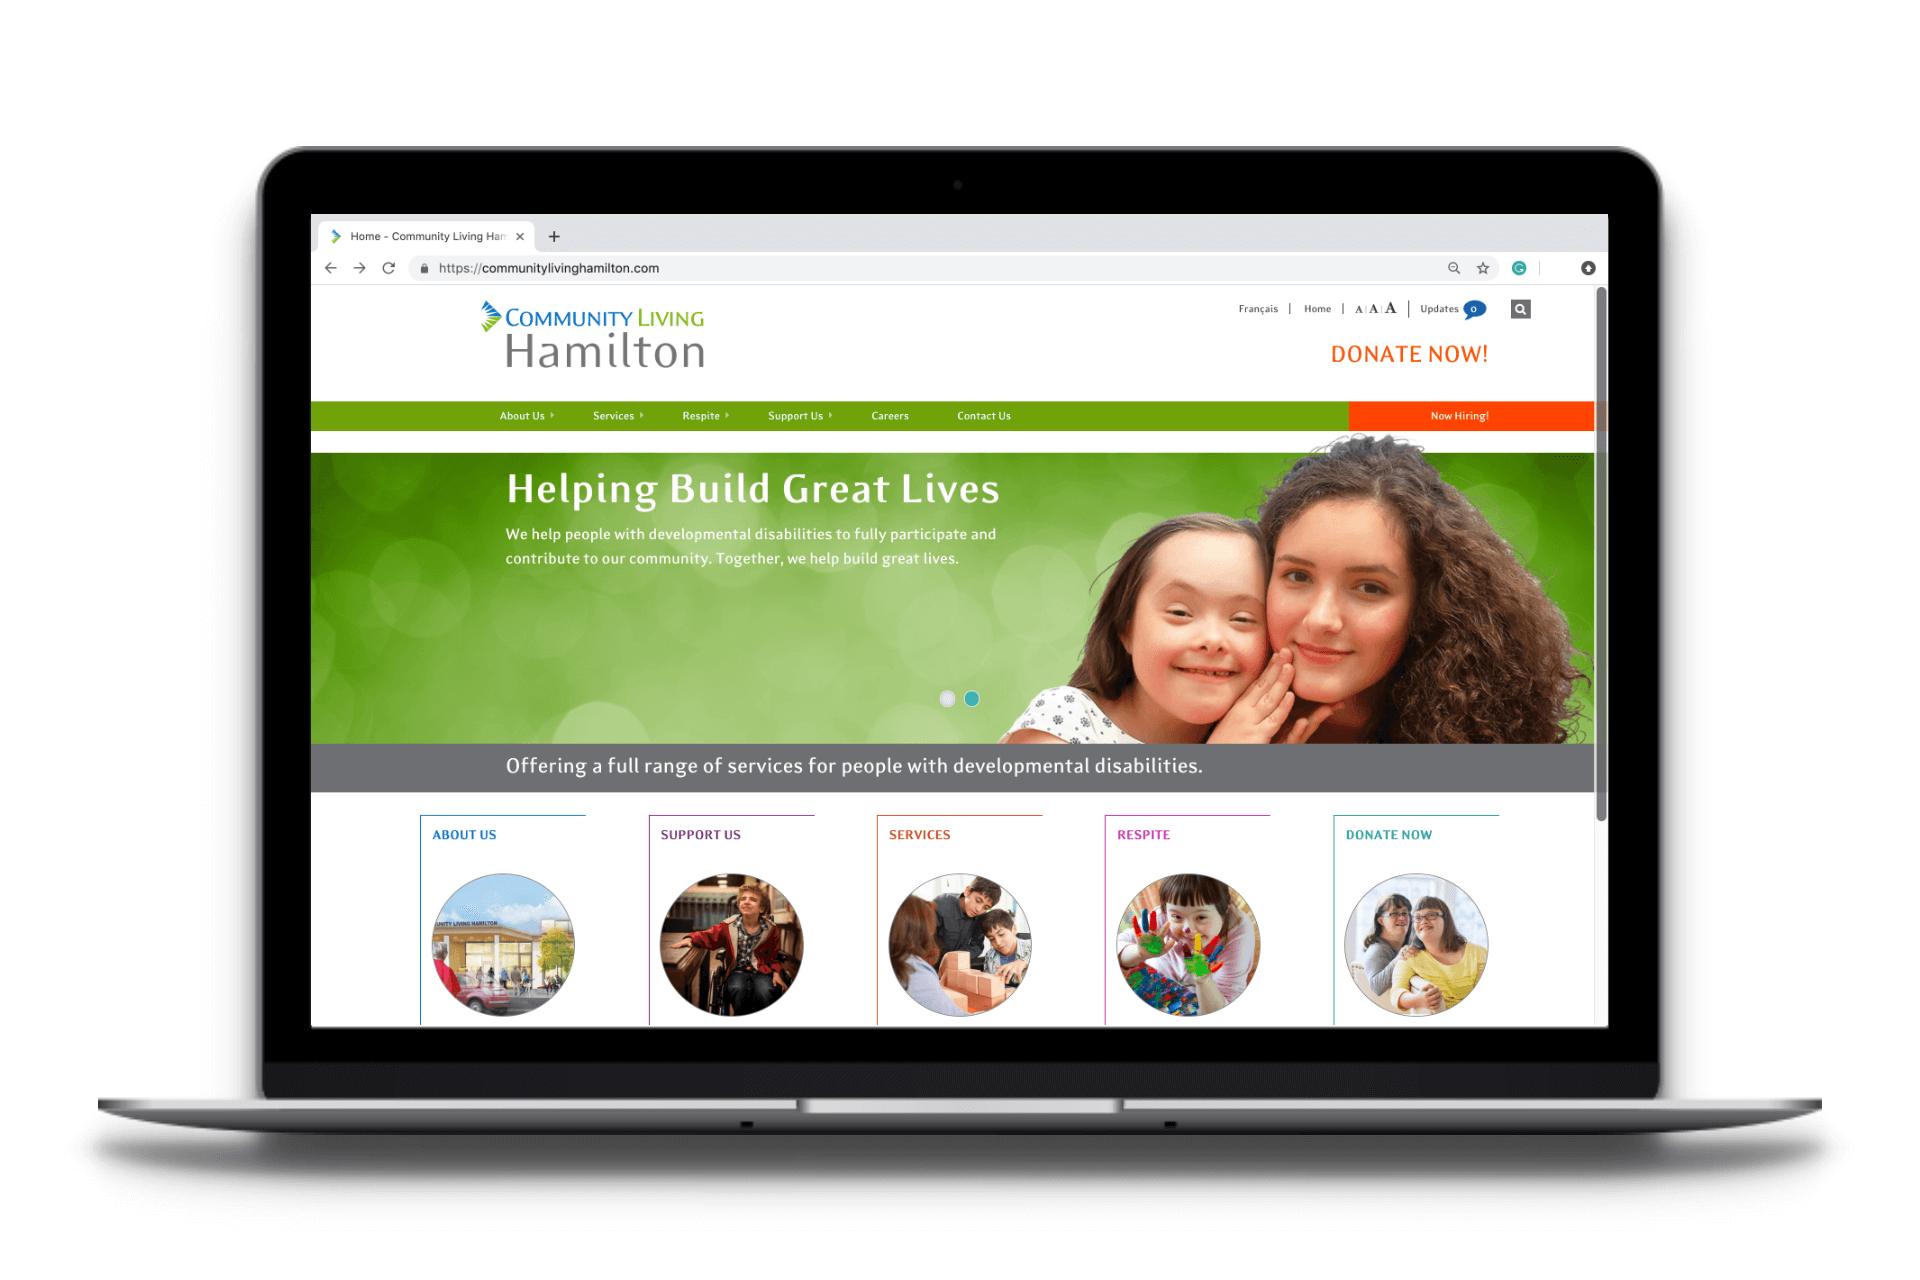 Website design for Community Living Hamilton - Home Page